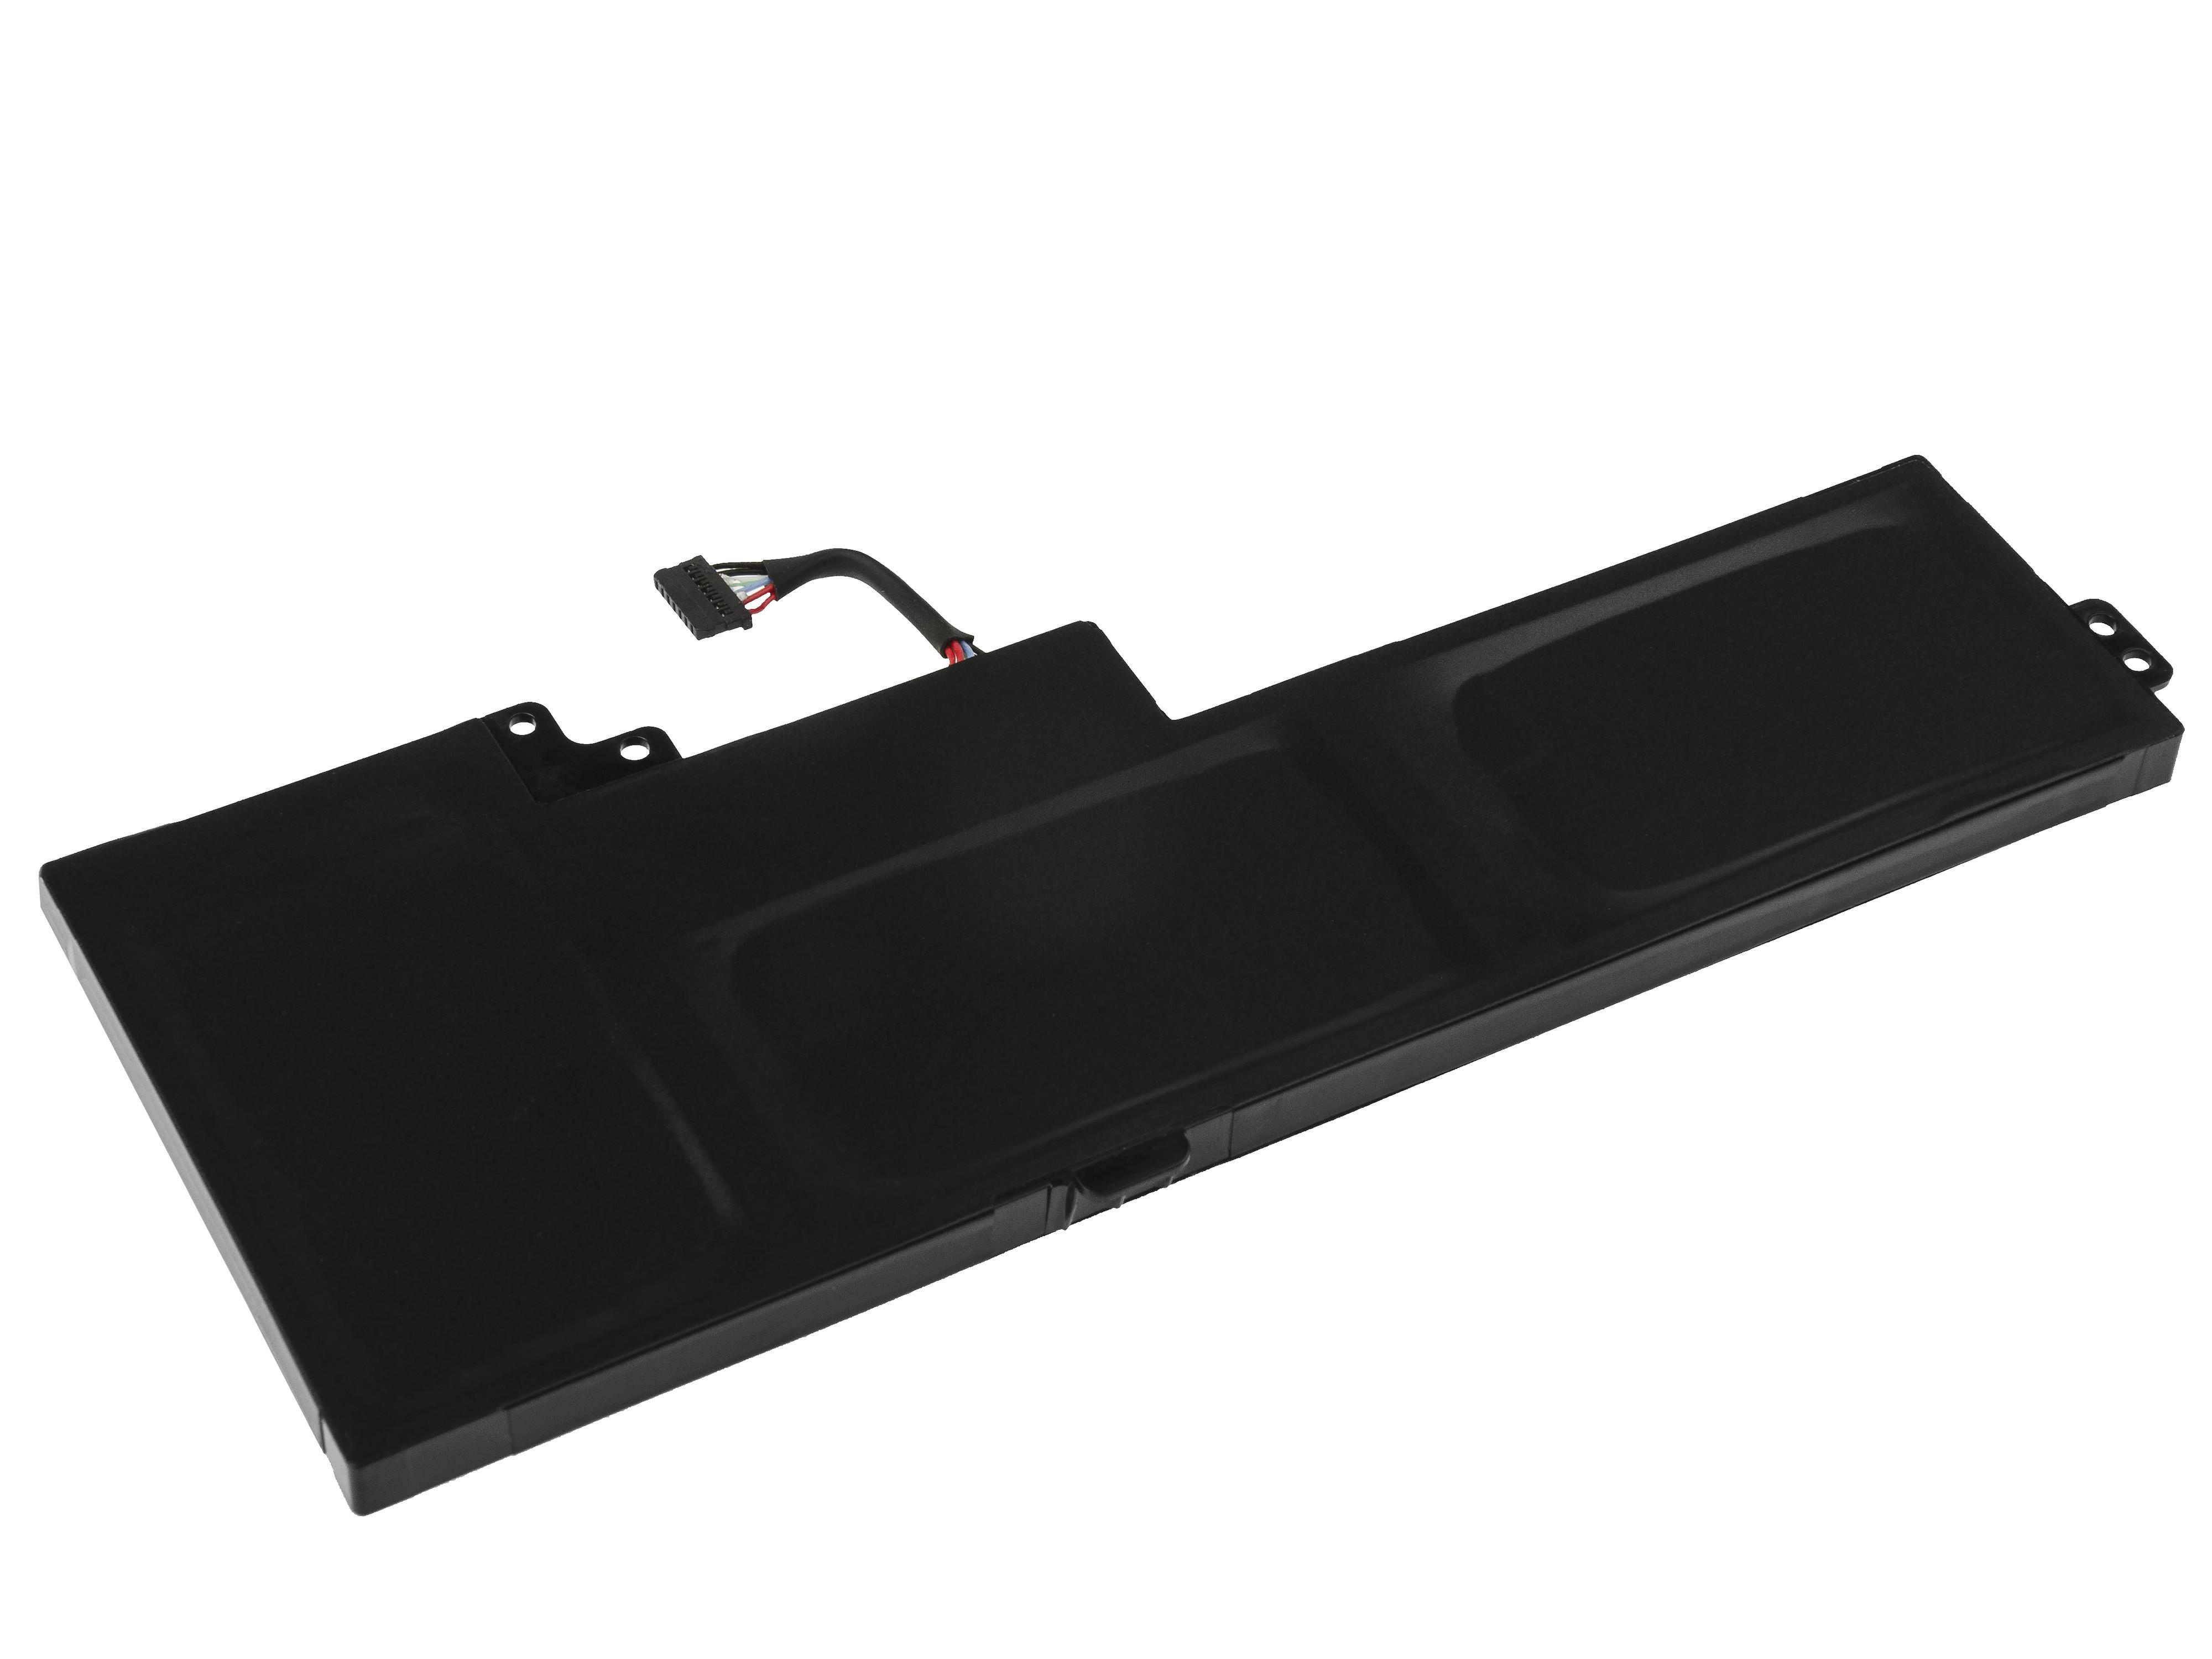 Green Cell LE144 Baterie Lenovo 01AV419 01AV420 01AV421 01AV489 pro Lenovo ThinkPad T470 T480 A475 A485 2100mAh Li-Pol – neoriginální